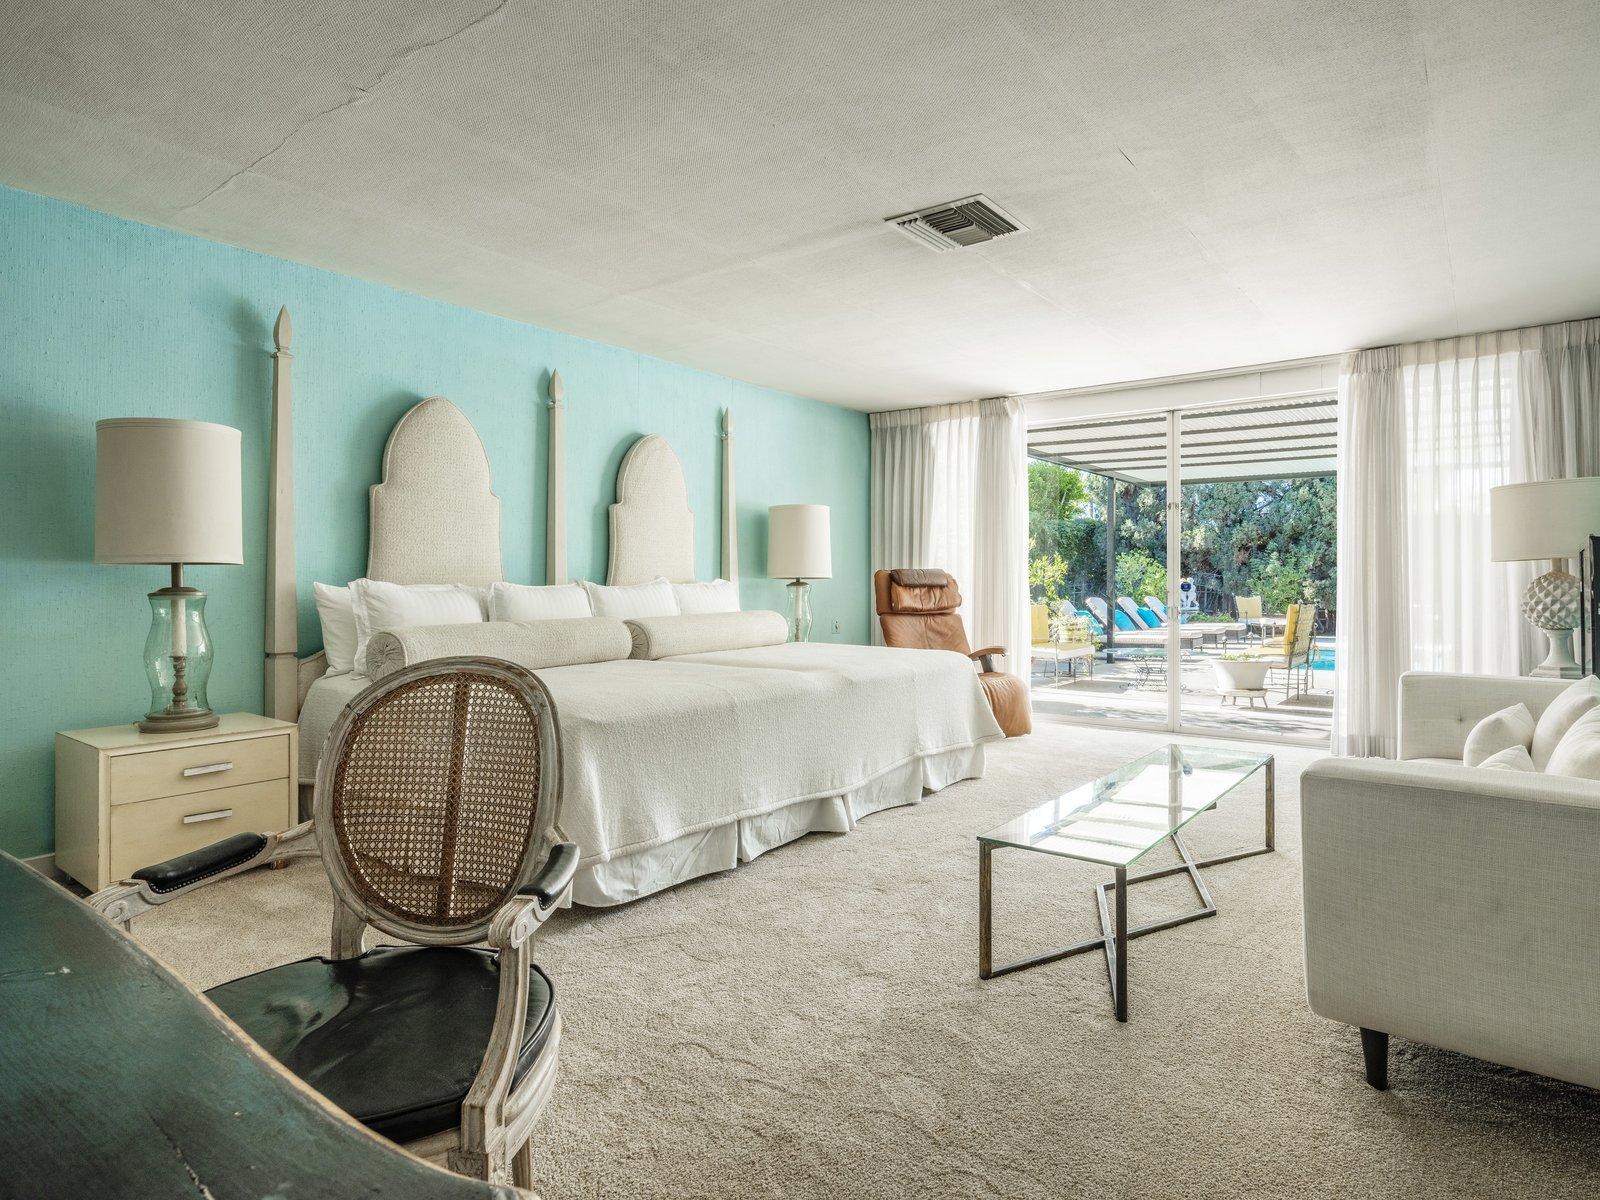 Arthur Elrod Palm Springs Escape House bedroom